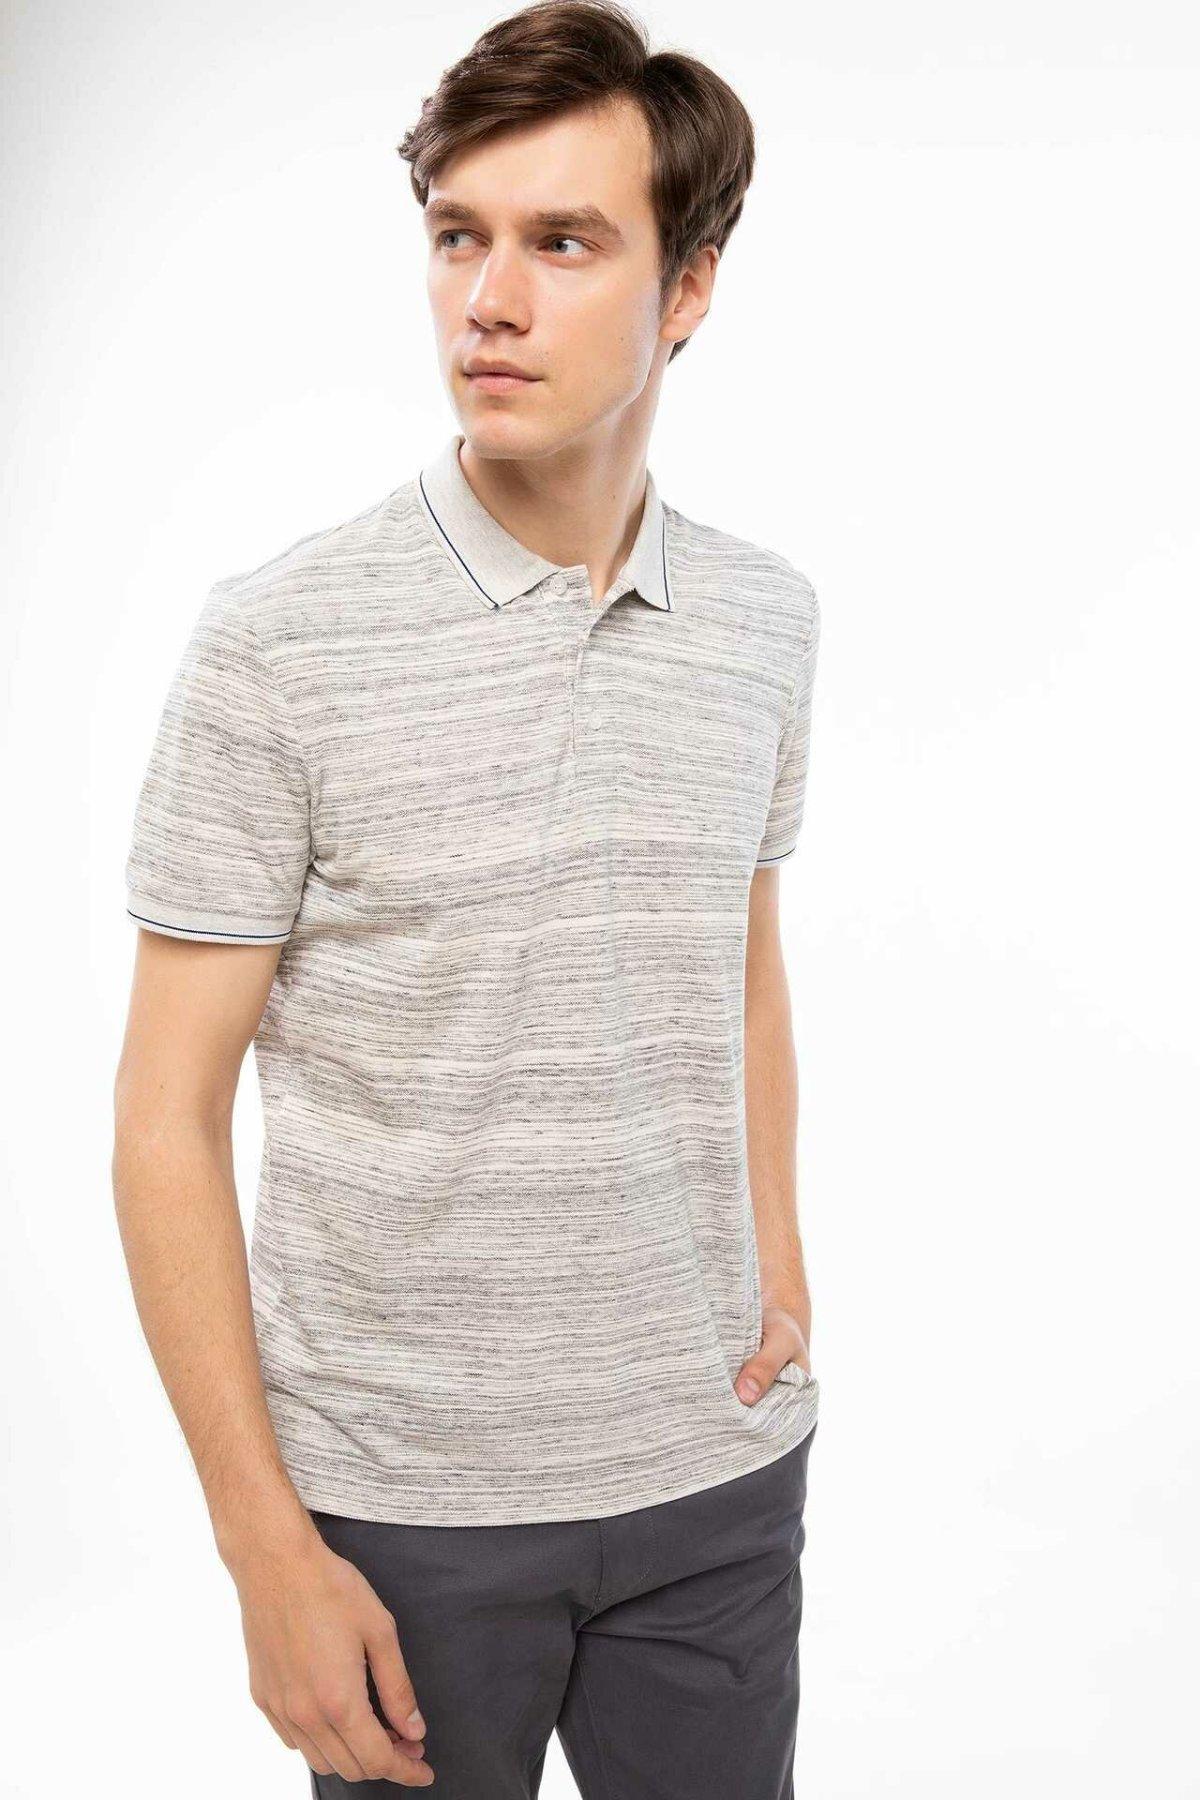 DeFacto Men Casual Summer Top Tees Light Grey Turn-down Collar Knitted Polo Cotton Shirt J0547AZ18AUGR210-J0547AZ18AU